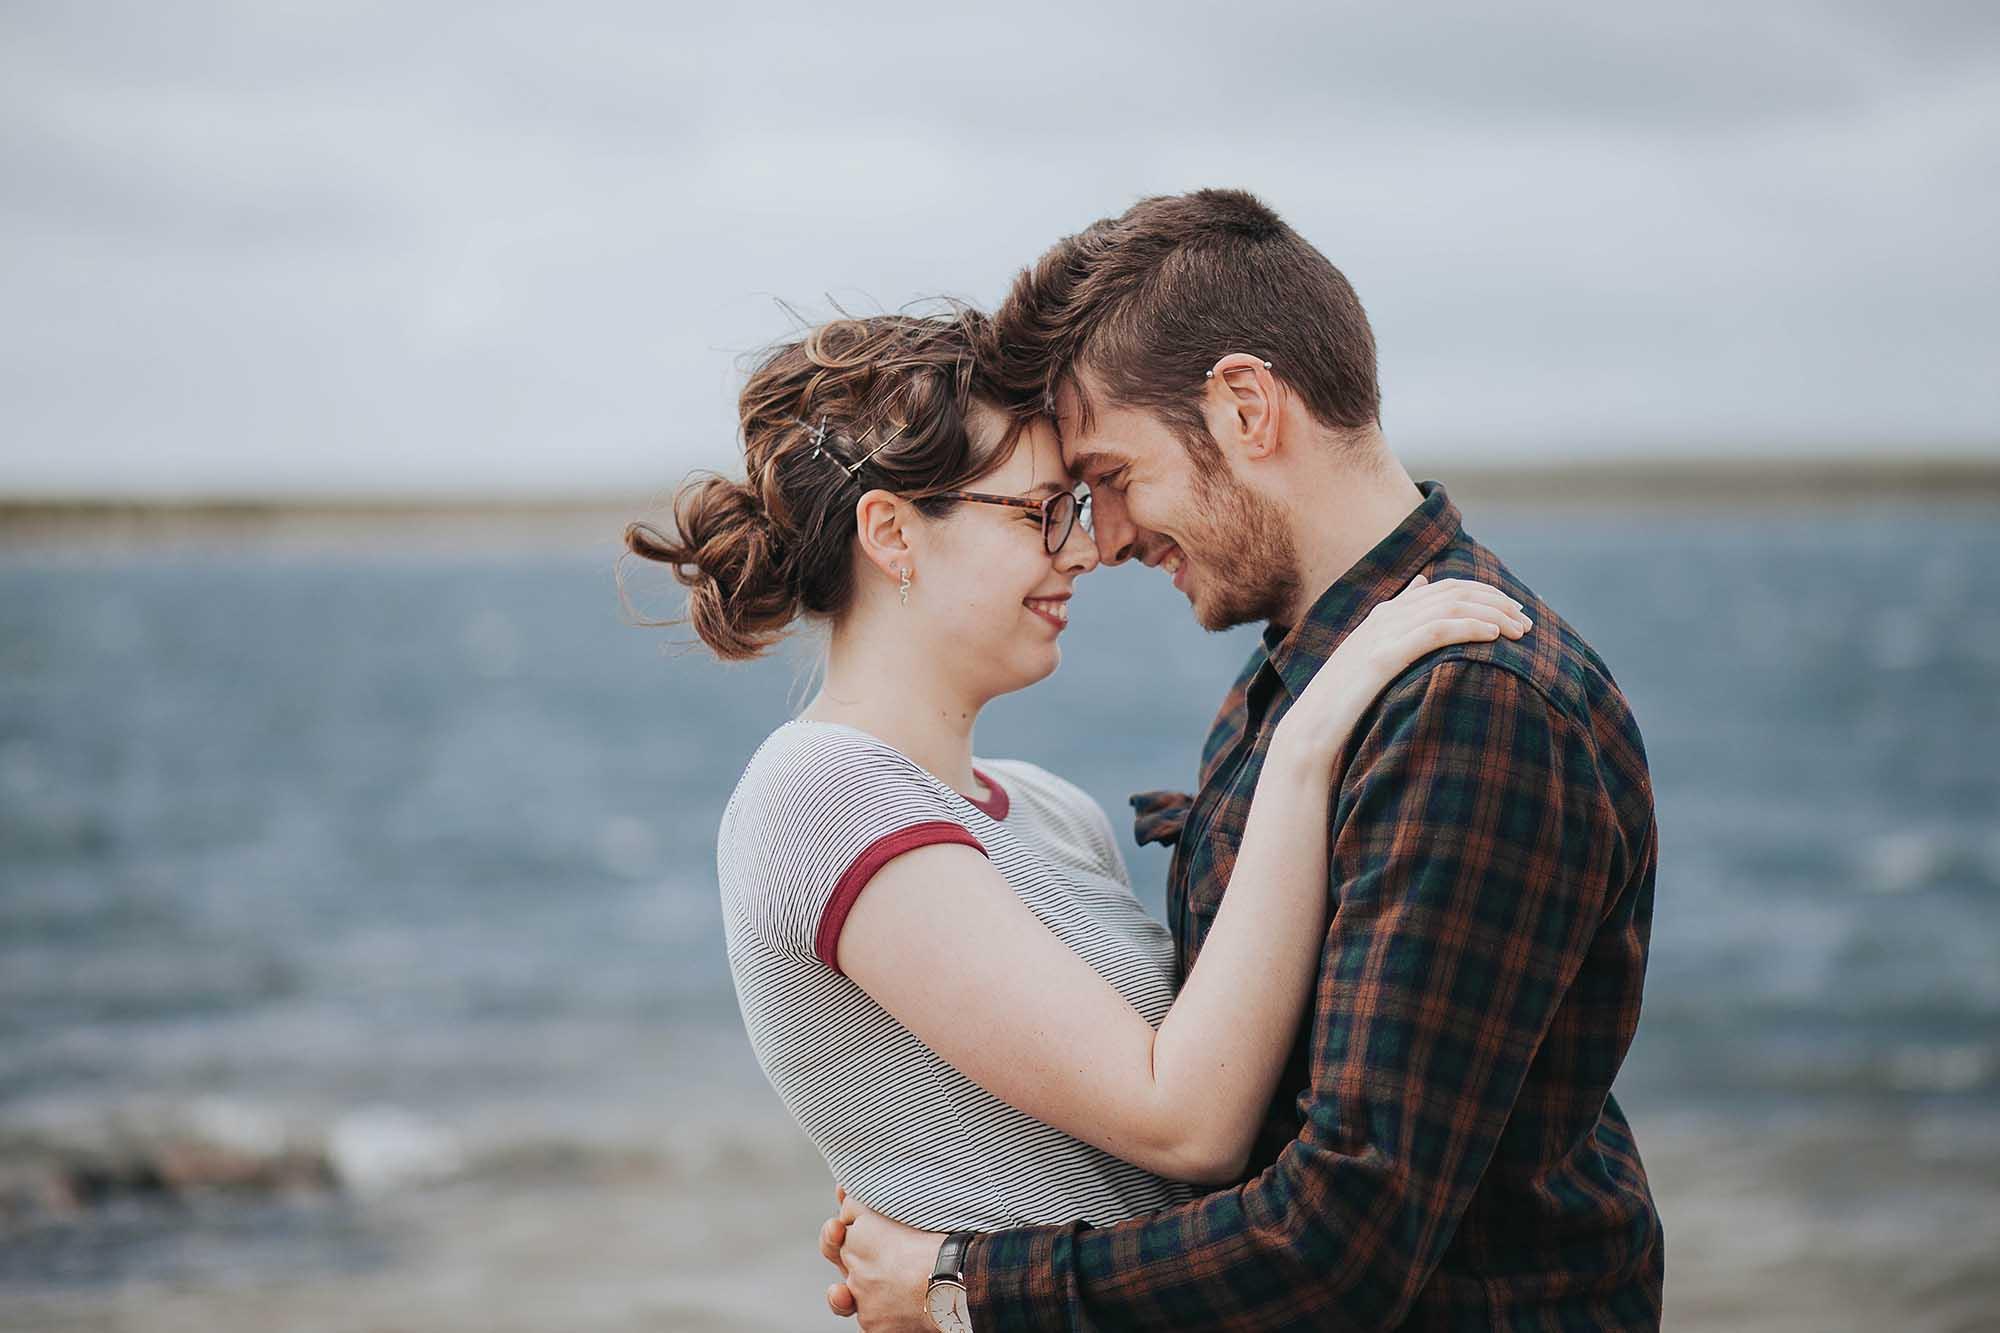 Engagement photography at Gaddings Dam